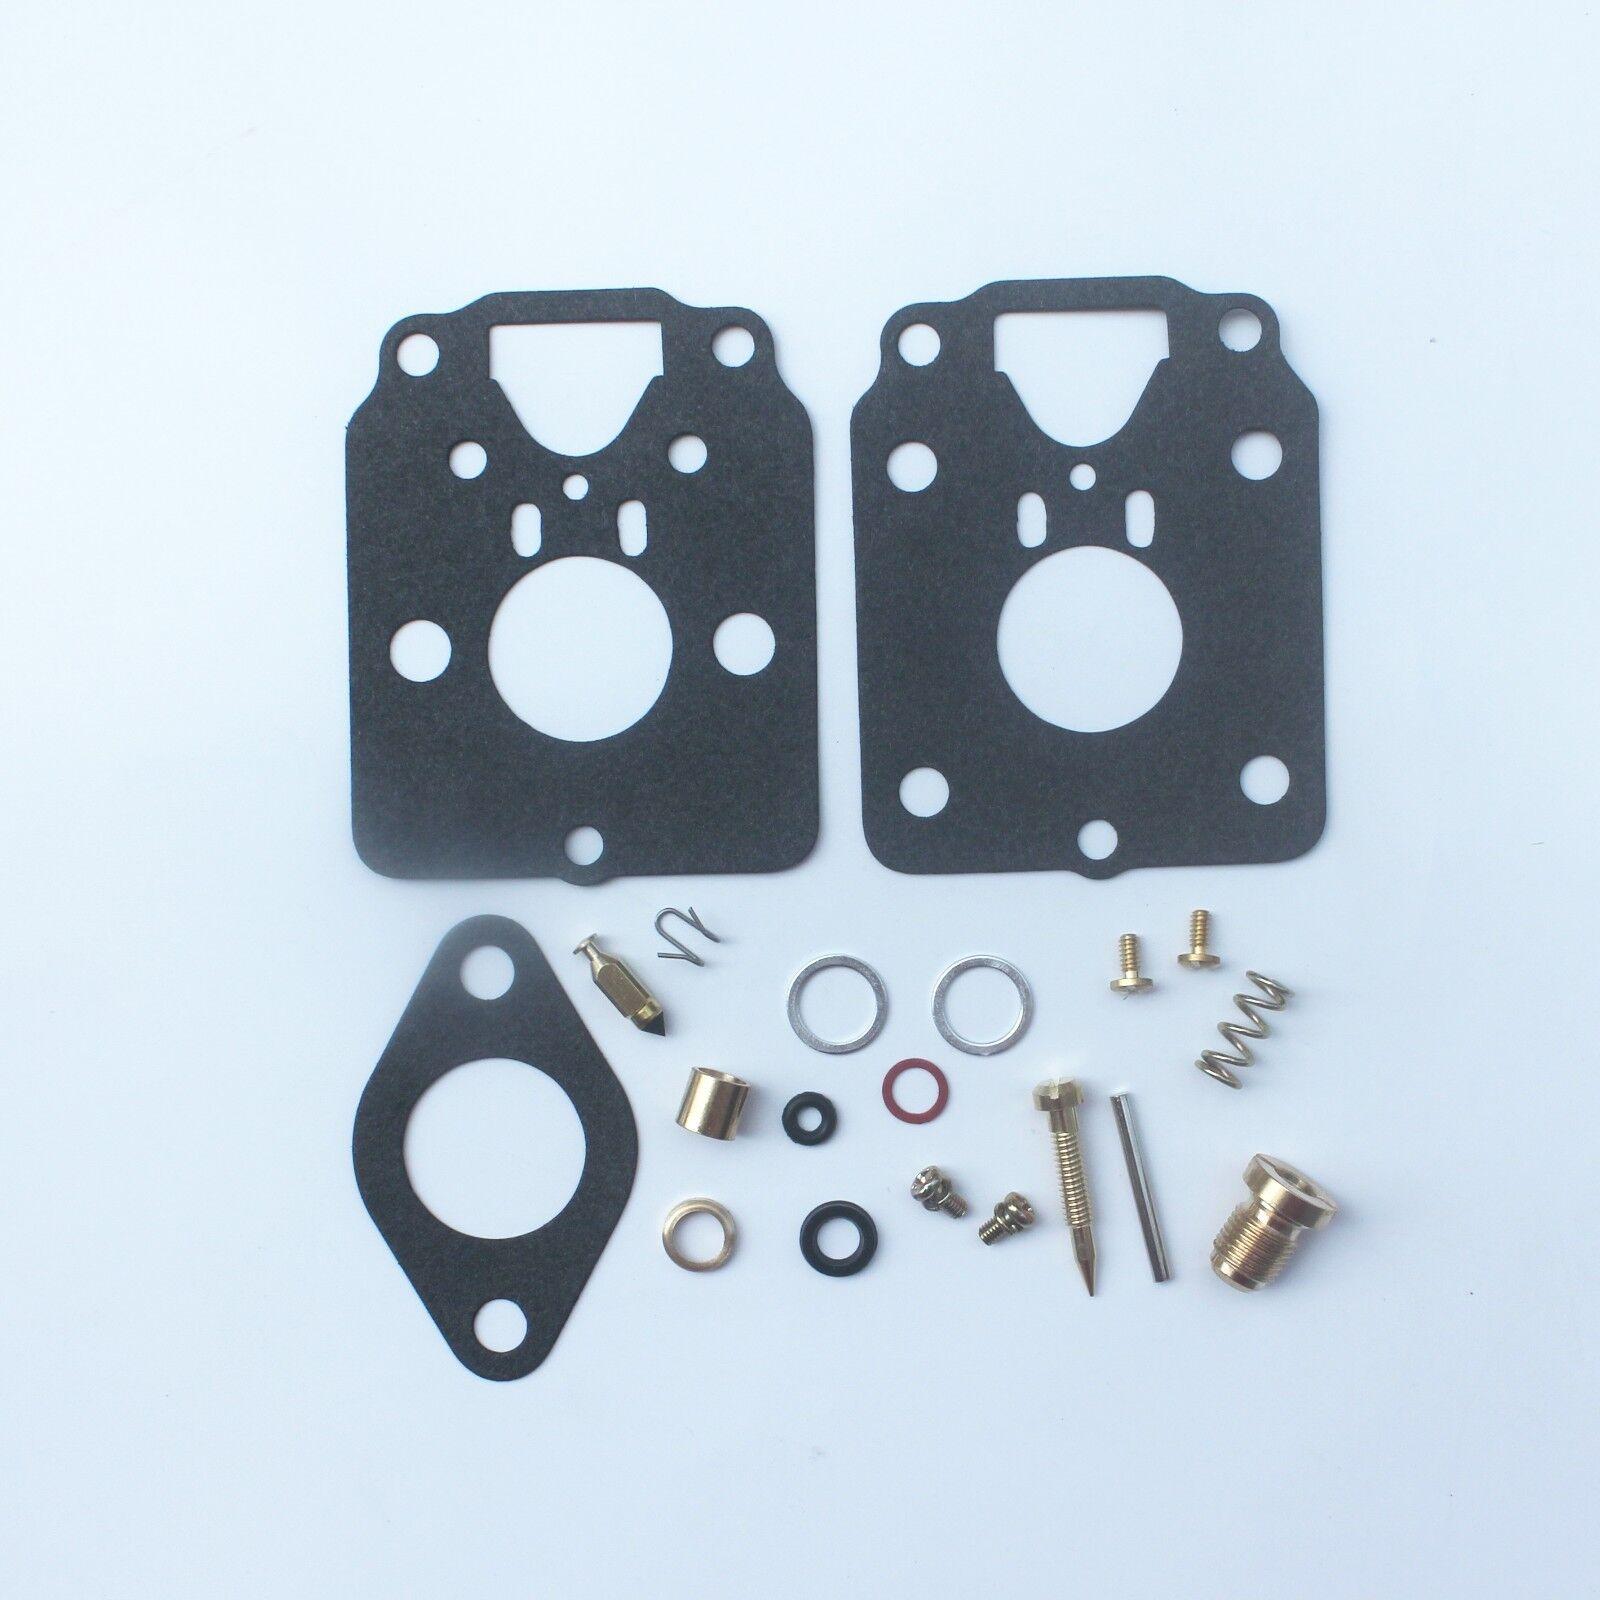 ONAN repair DD CARB KIT WITH PUMP PLATE  142-0553